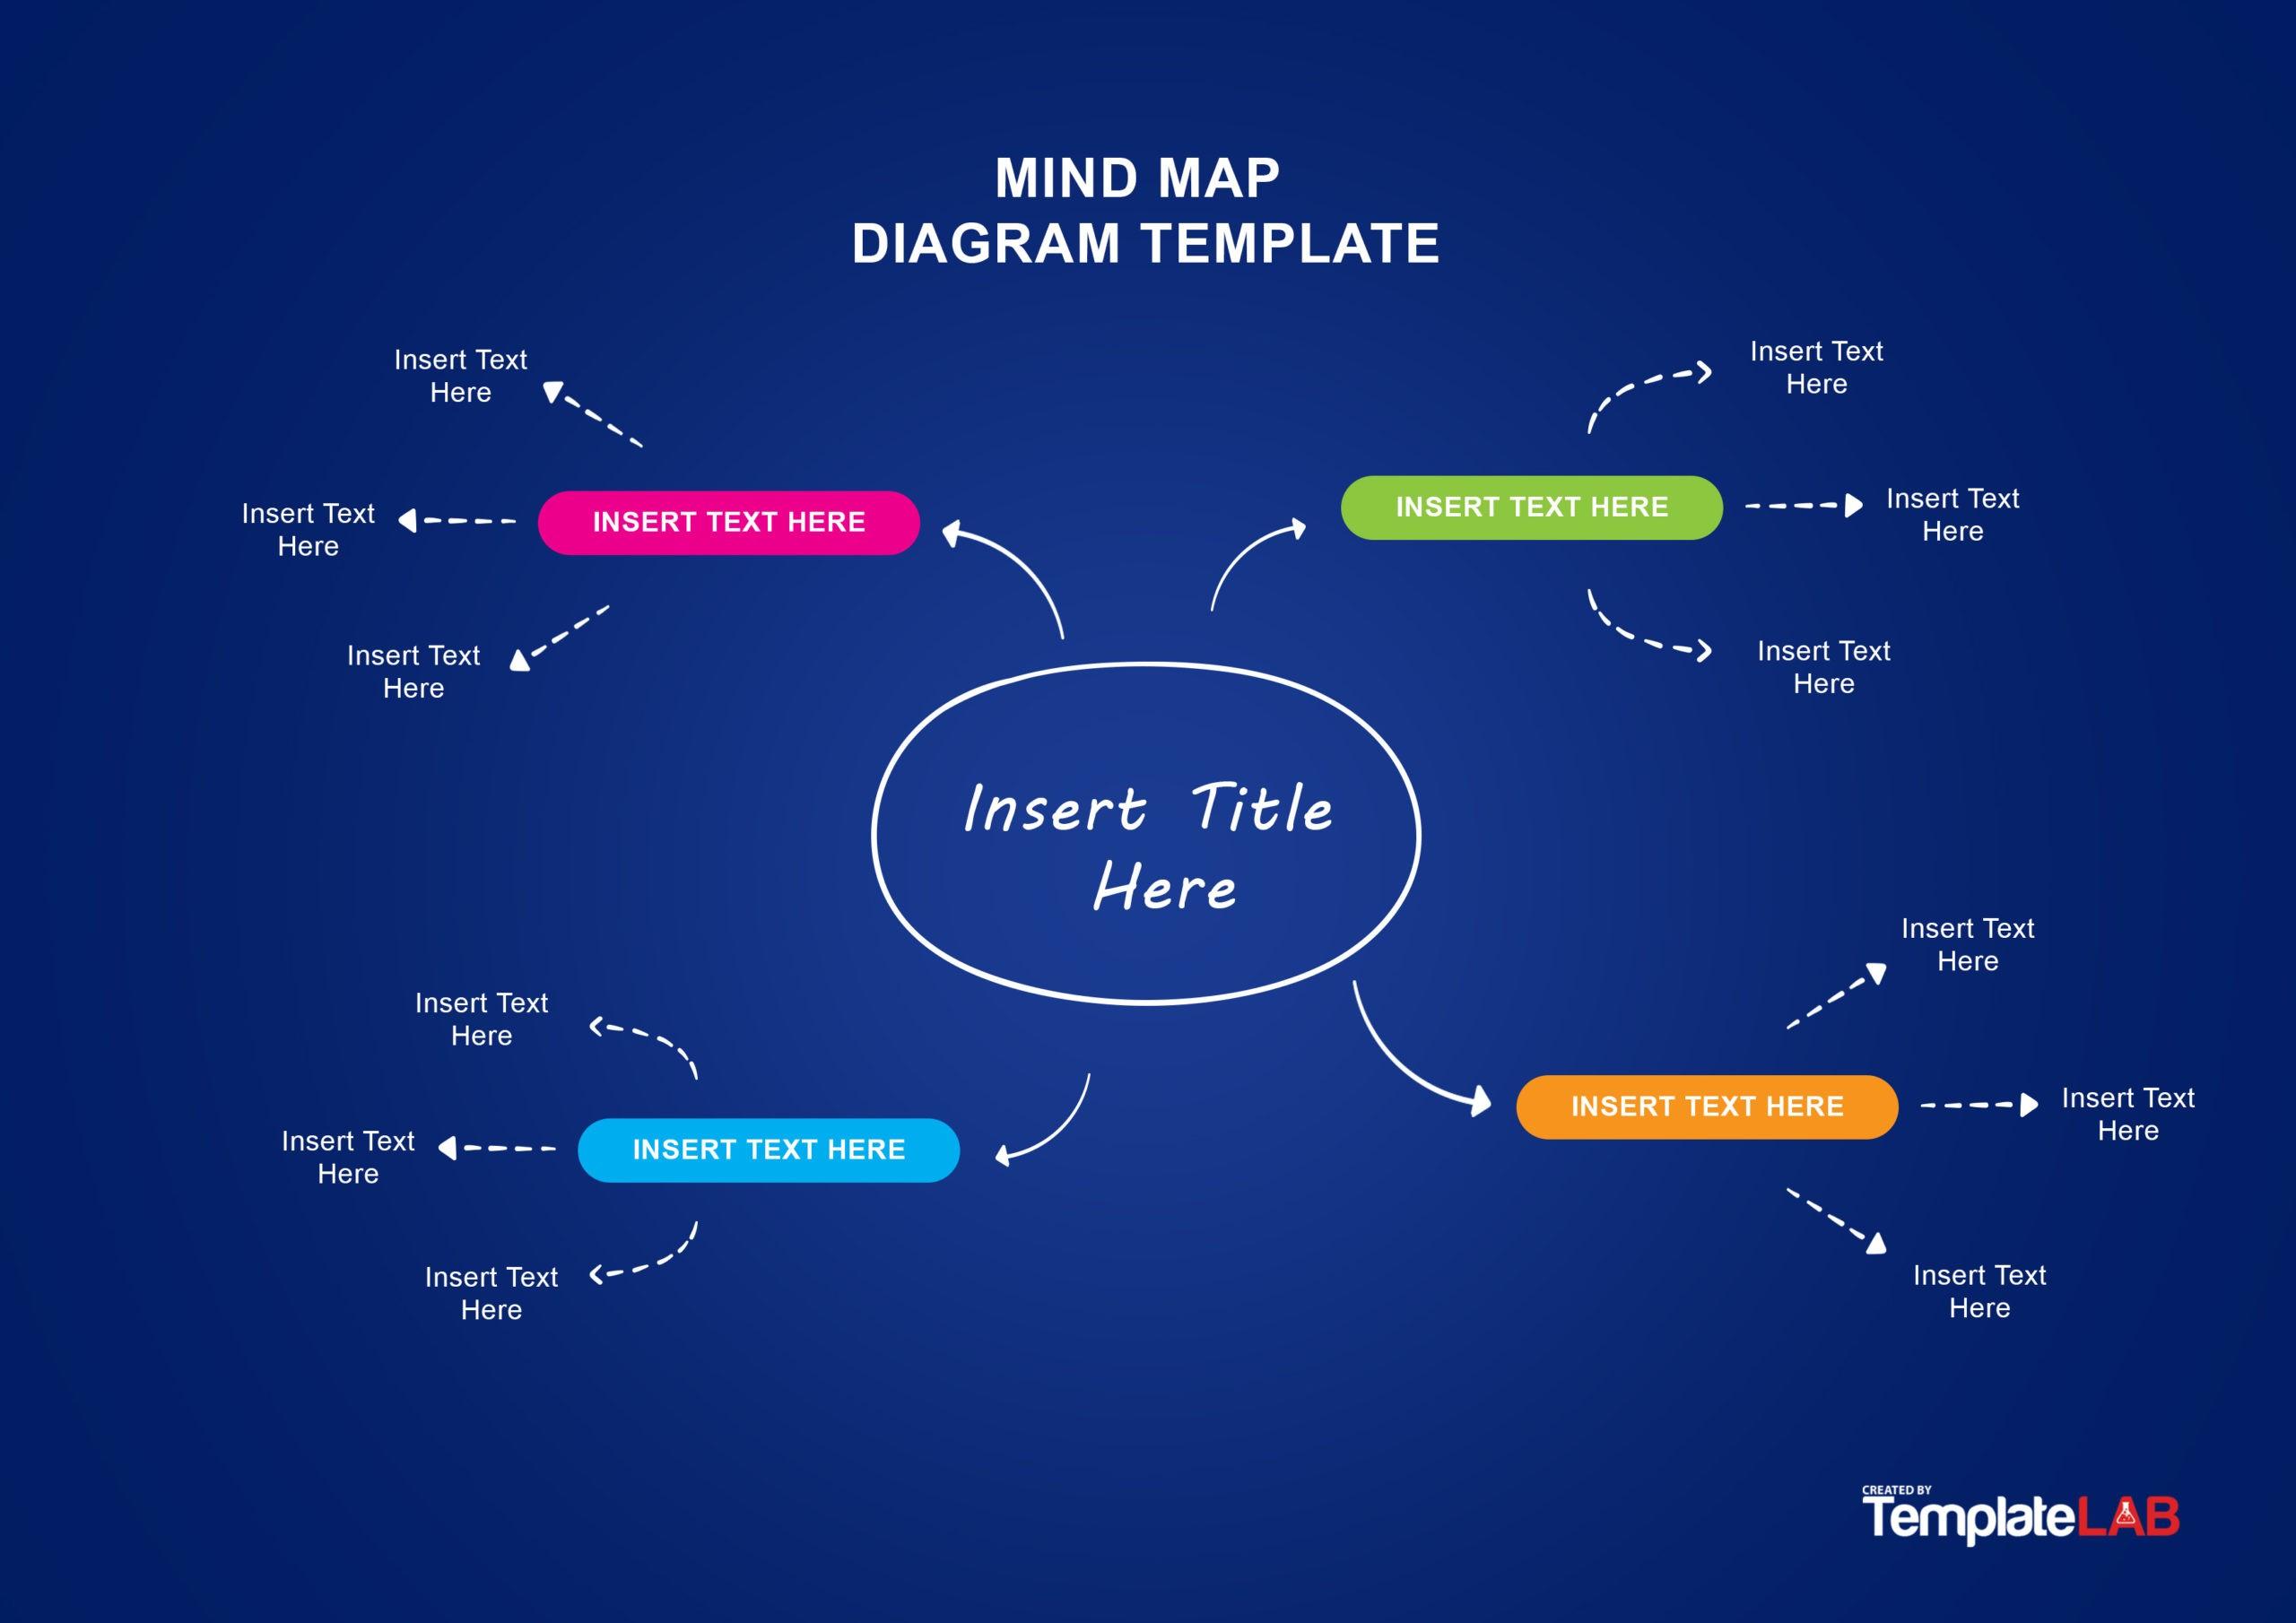 Free Mind Map Template 09 - TemplateLab.com